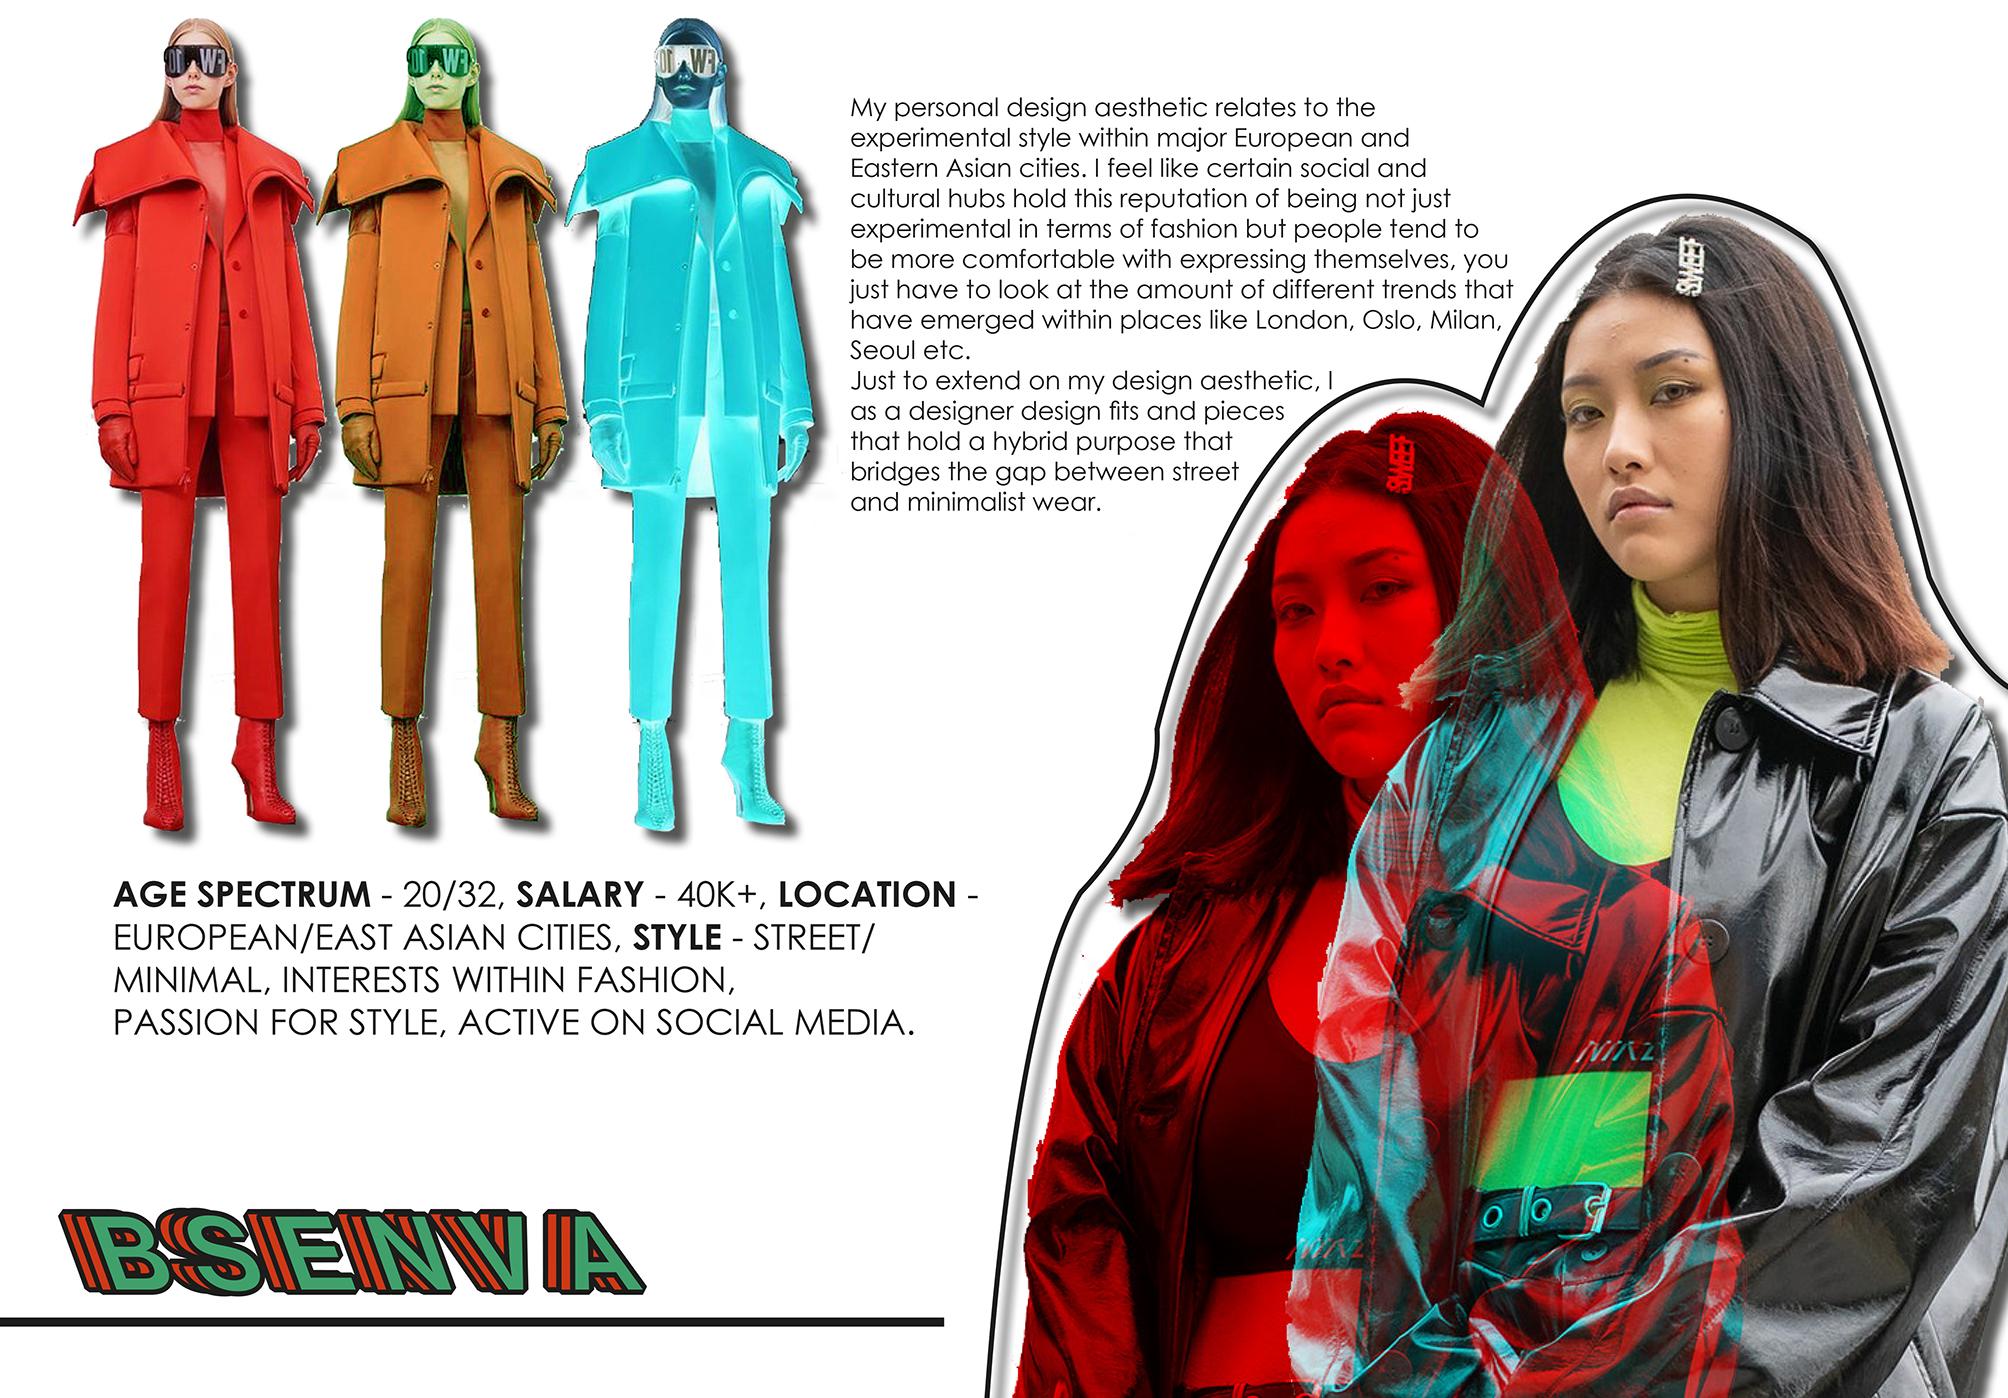 Benjamin Jacob Evans Fashion Design and Promotion